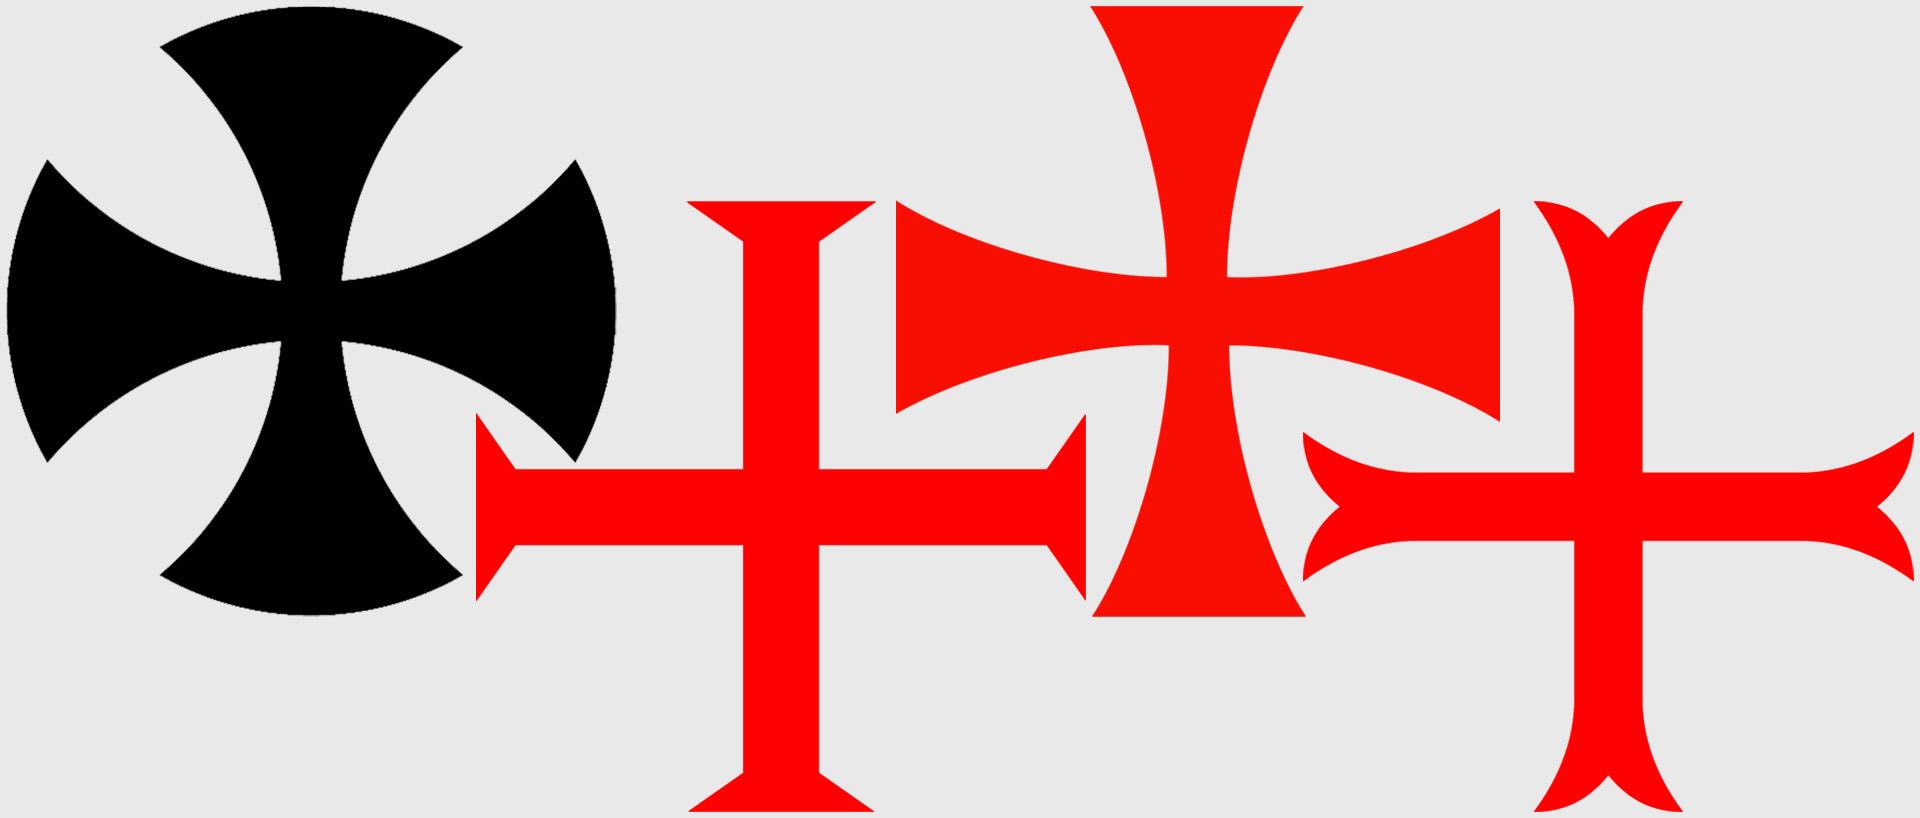 тамплиерских крестов картинки